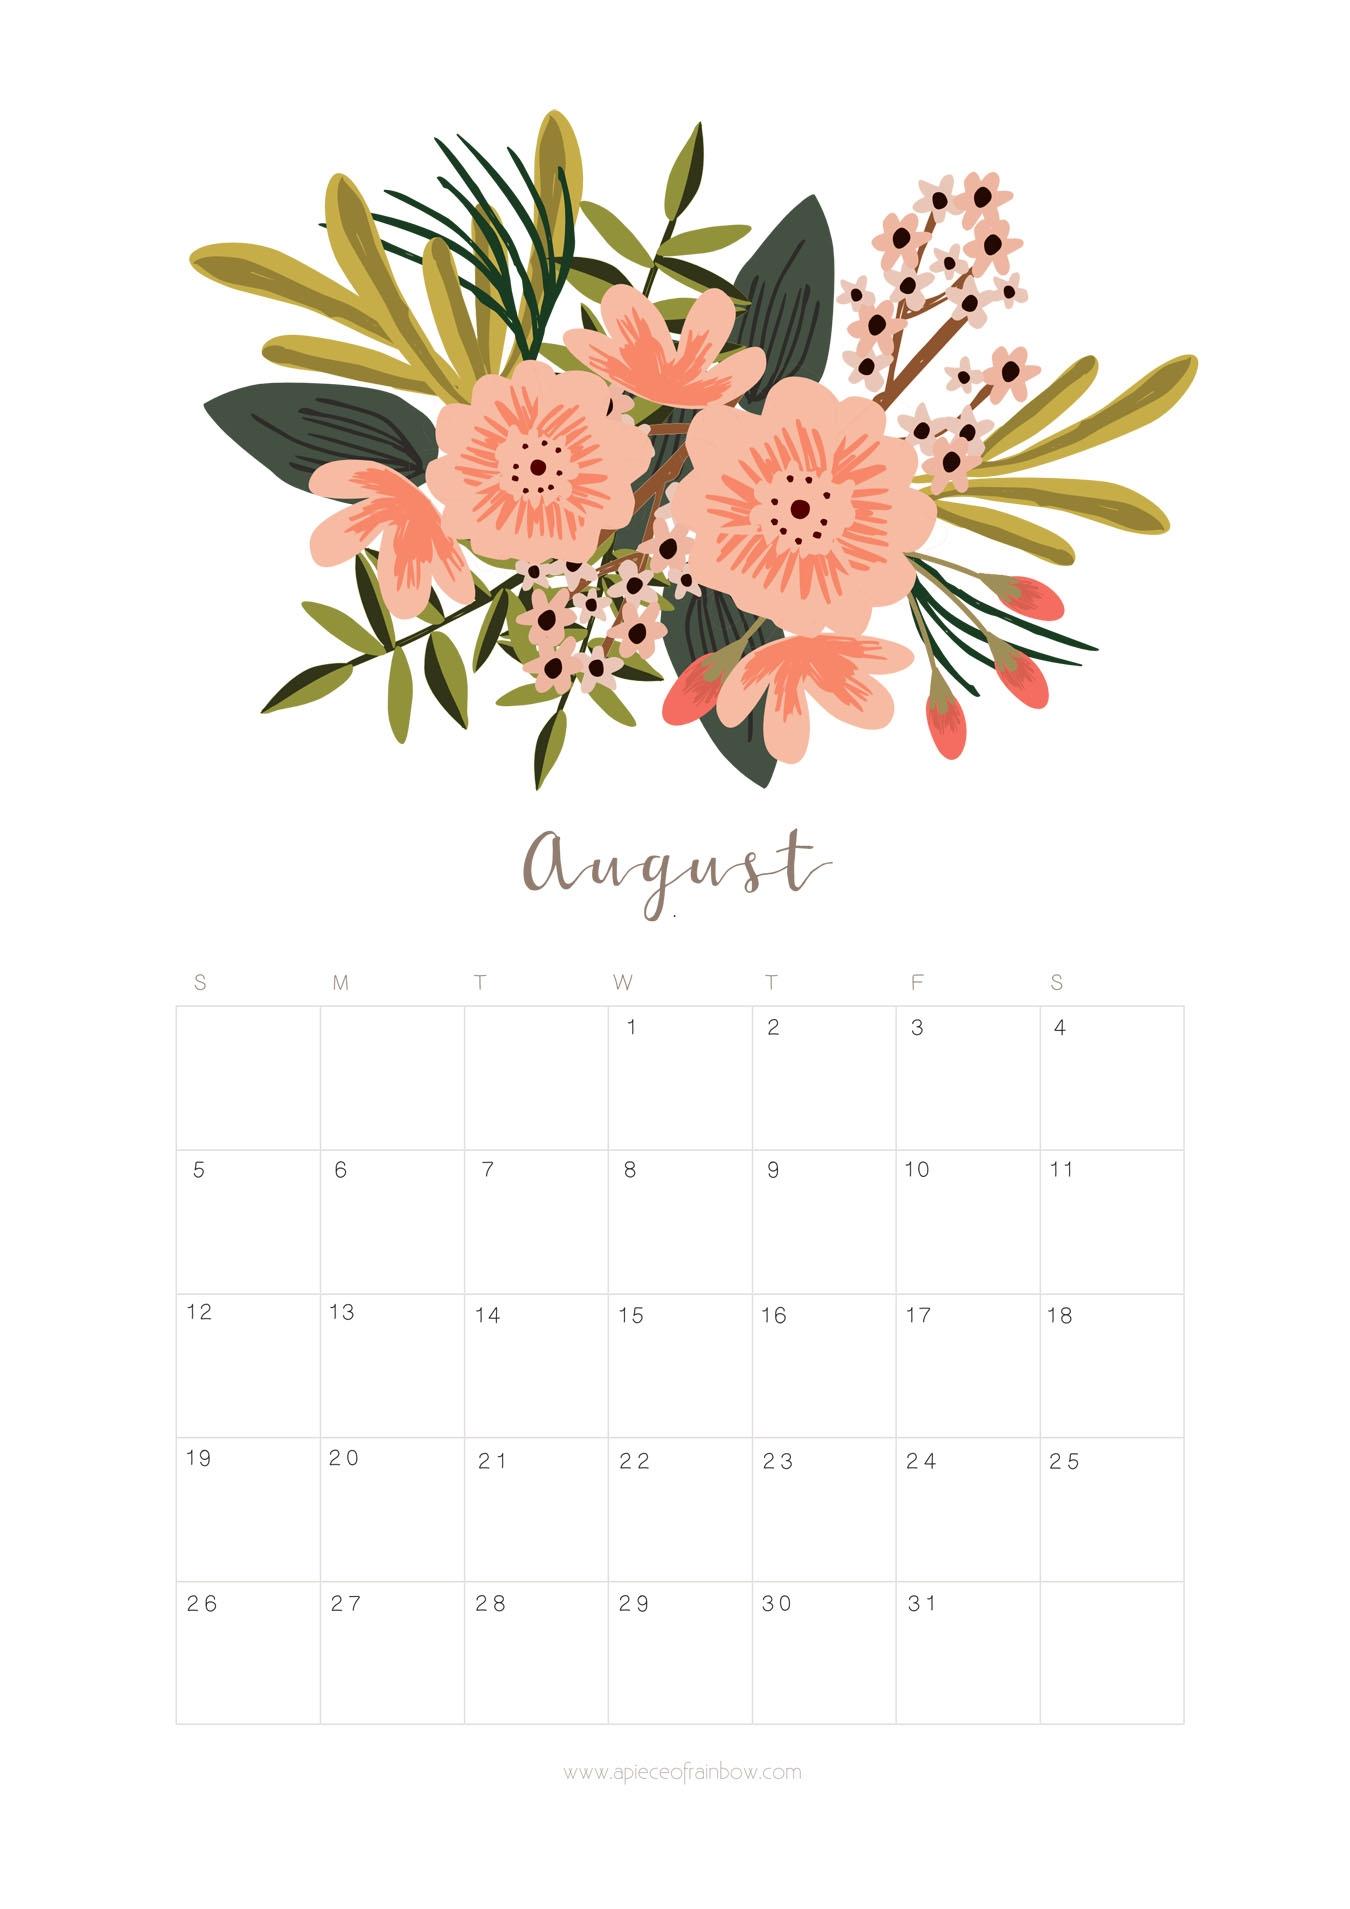 calendar may 2018 printable list calendar 2018 printable Calendar August 2018 Printable Zodiac erdferdf